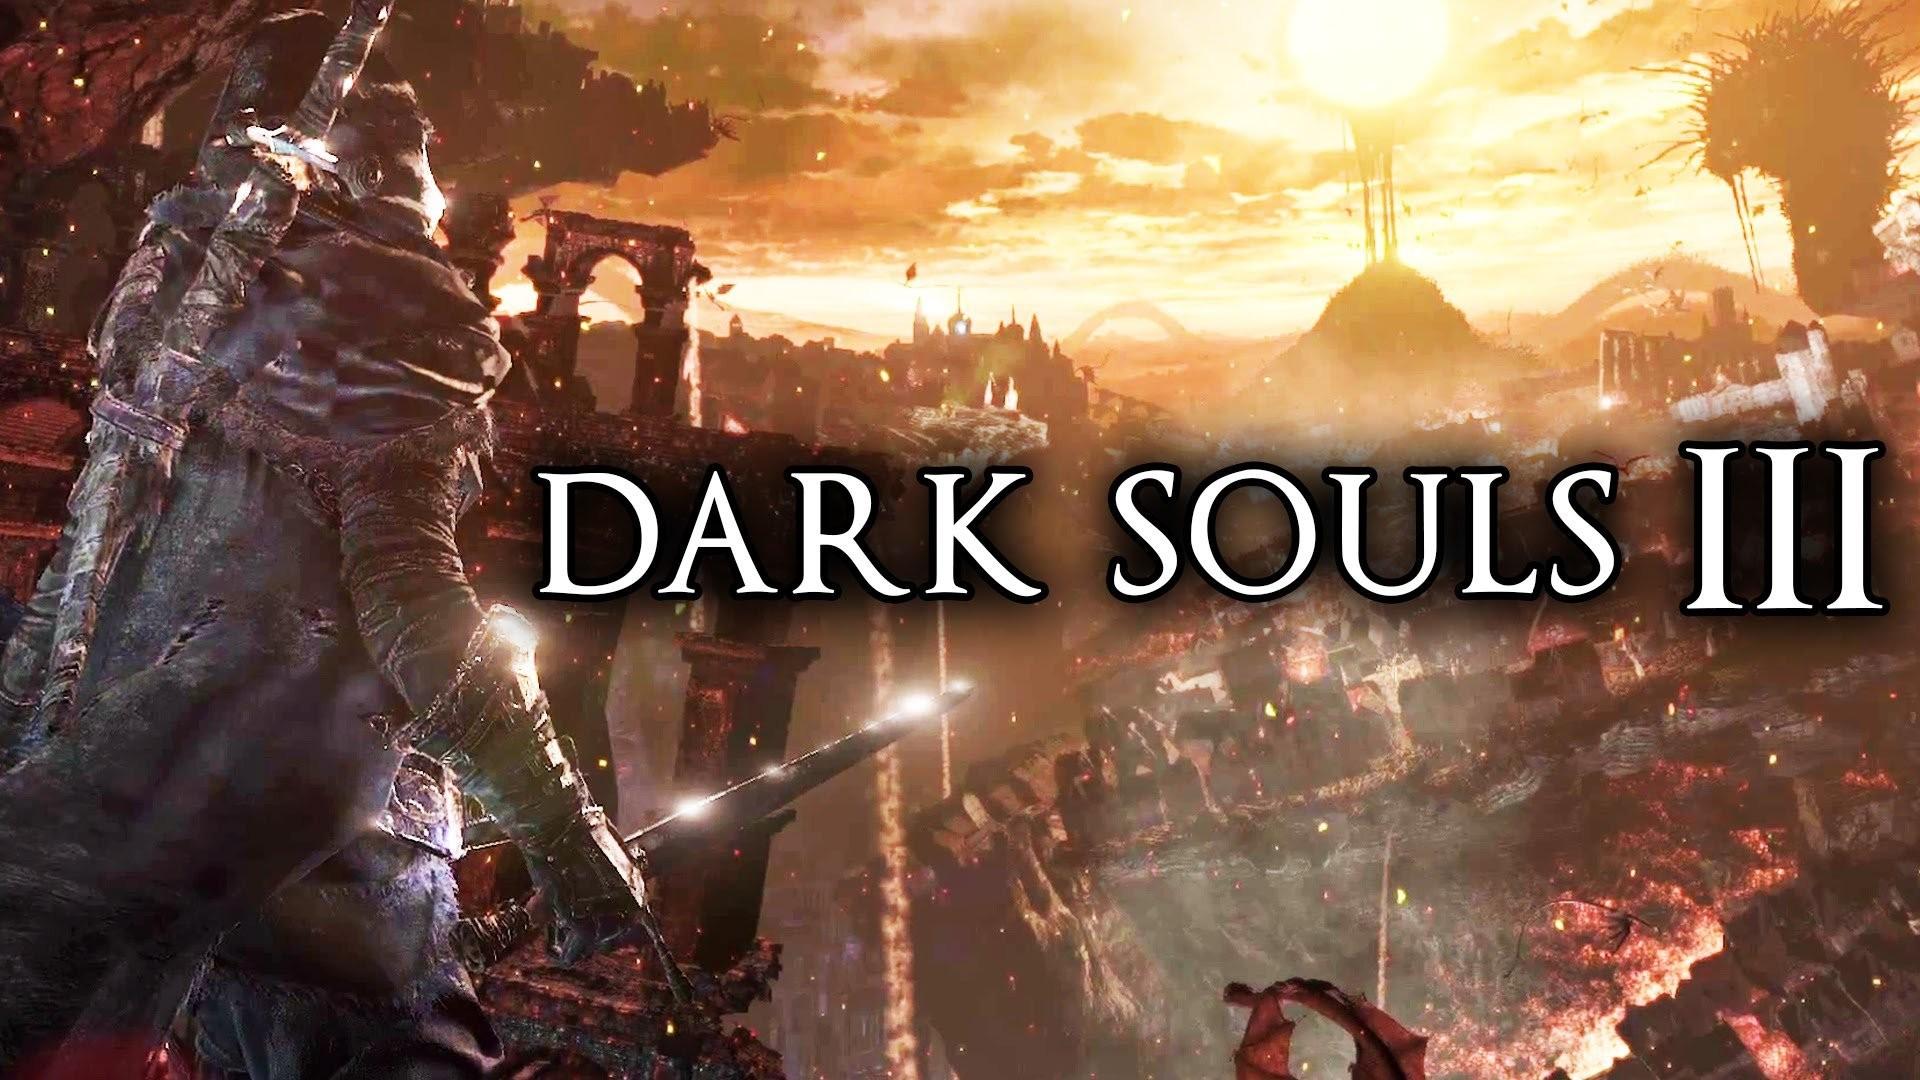 Dark Souls 3 Wallpaper 1920x1080 ·① Download Free Awesome